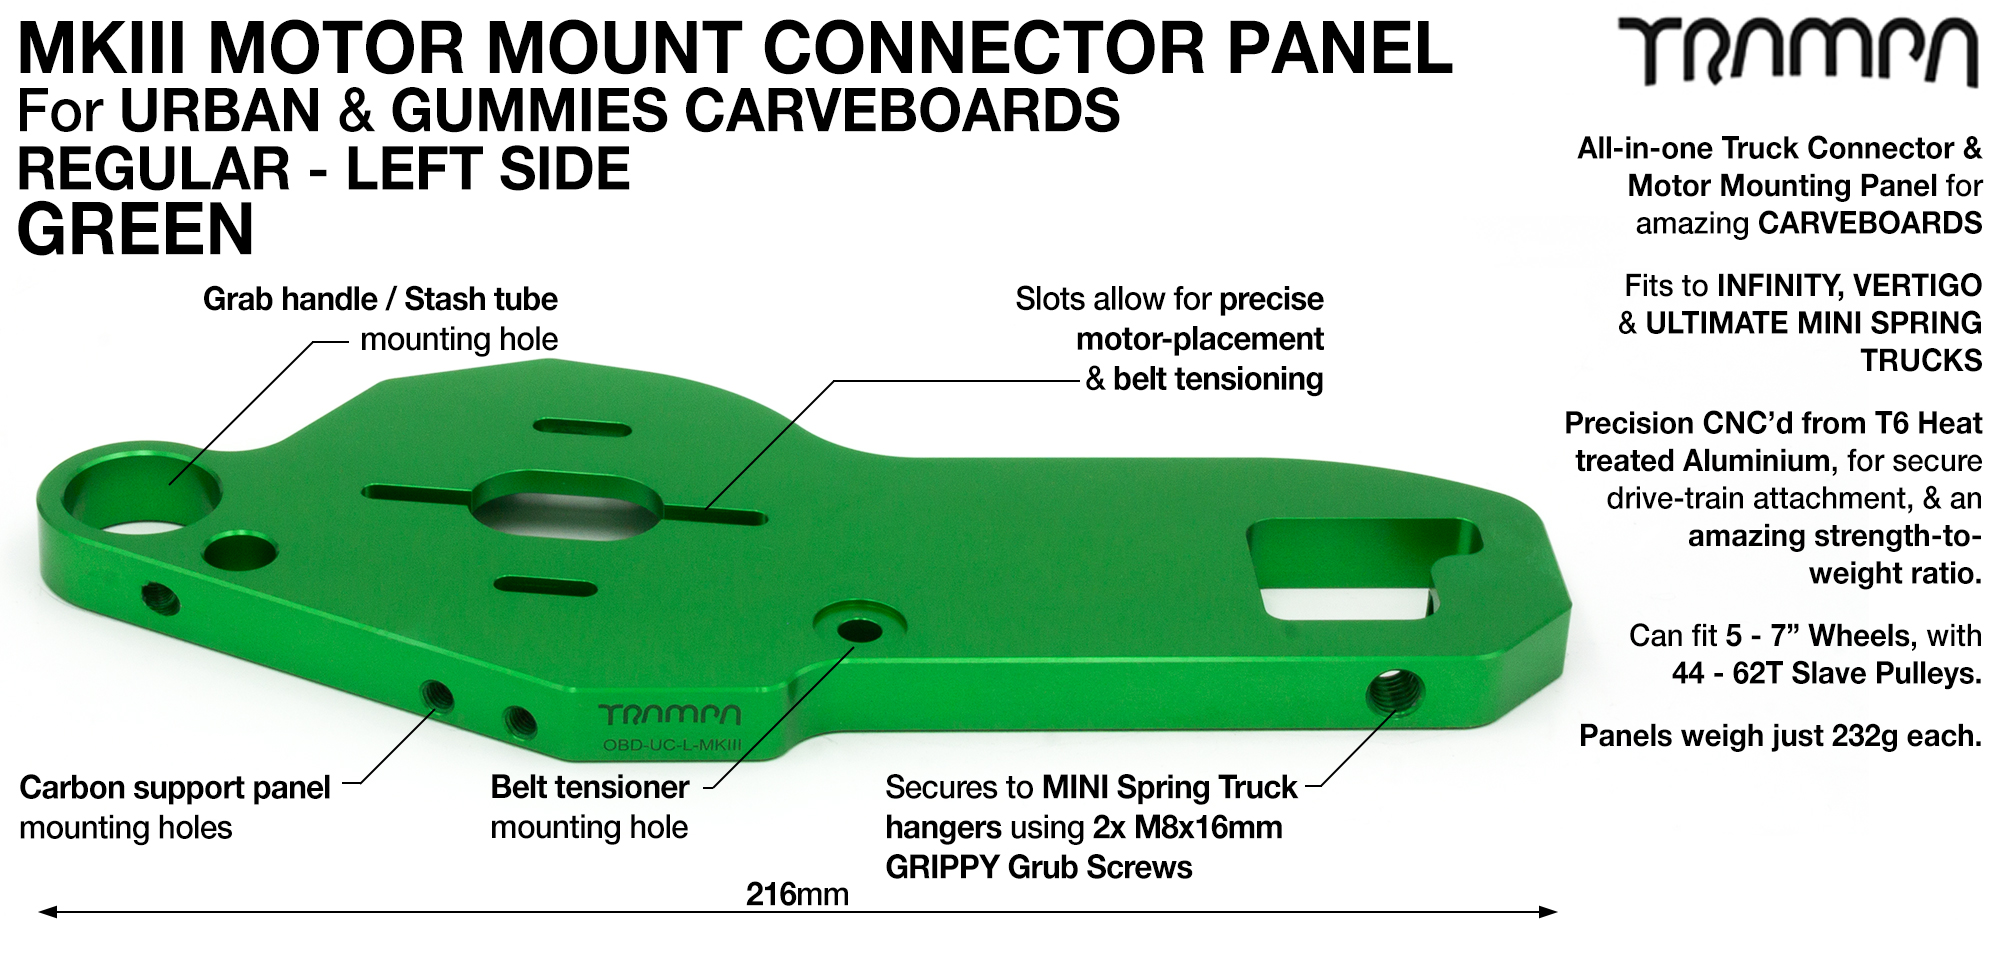 MkIII CARVE Truck Motor Mount T6 Aluminium Anodised - REGULAR GREEN